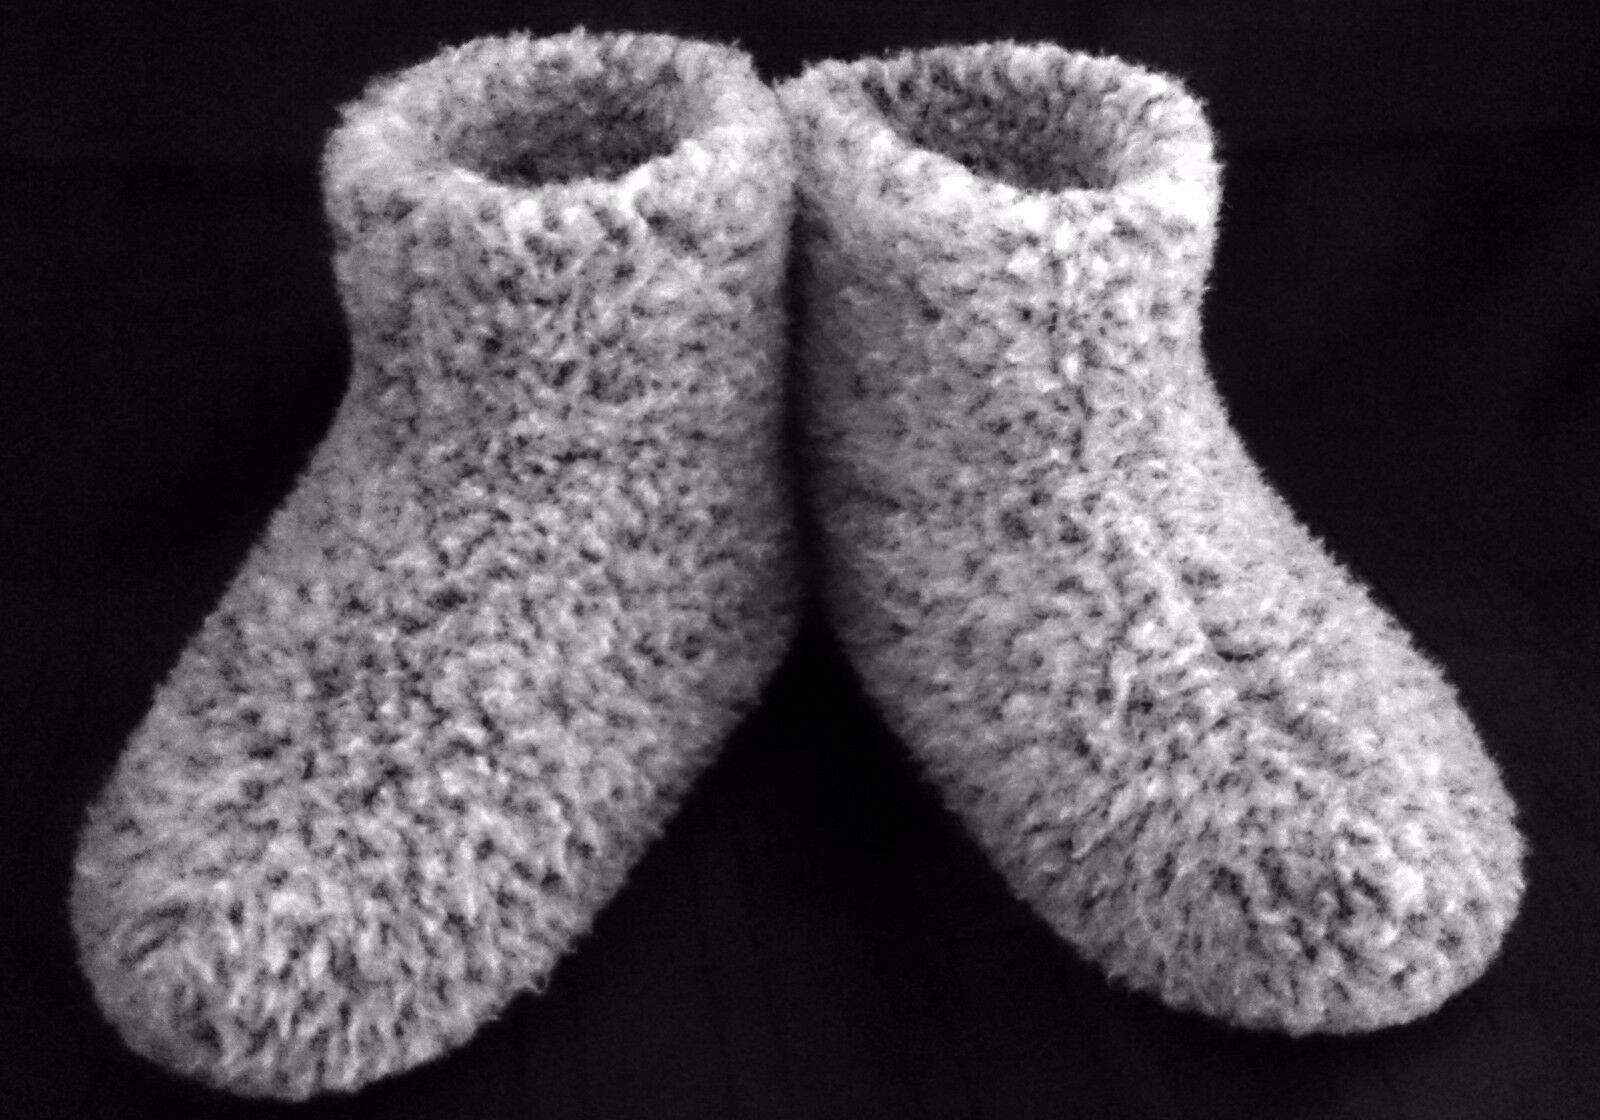 Size 10.5 - GREY - MEN'S MERINO WOOL BOOTS WARM COZY SLIPPERS MOCCASINS CHUNI